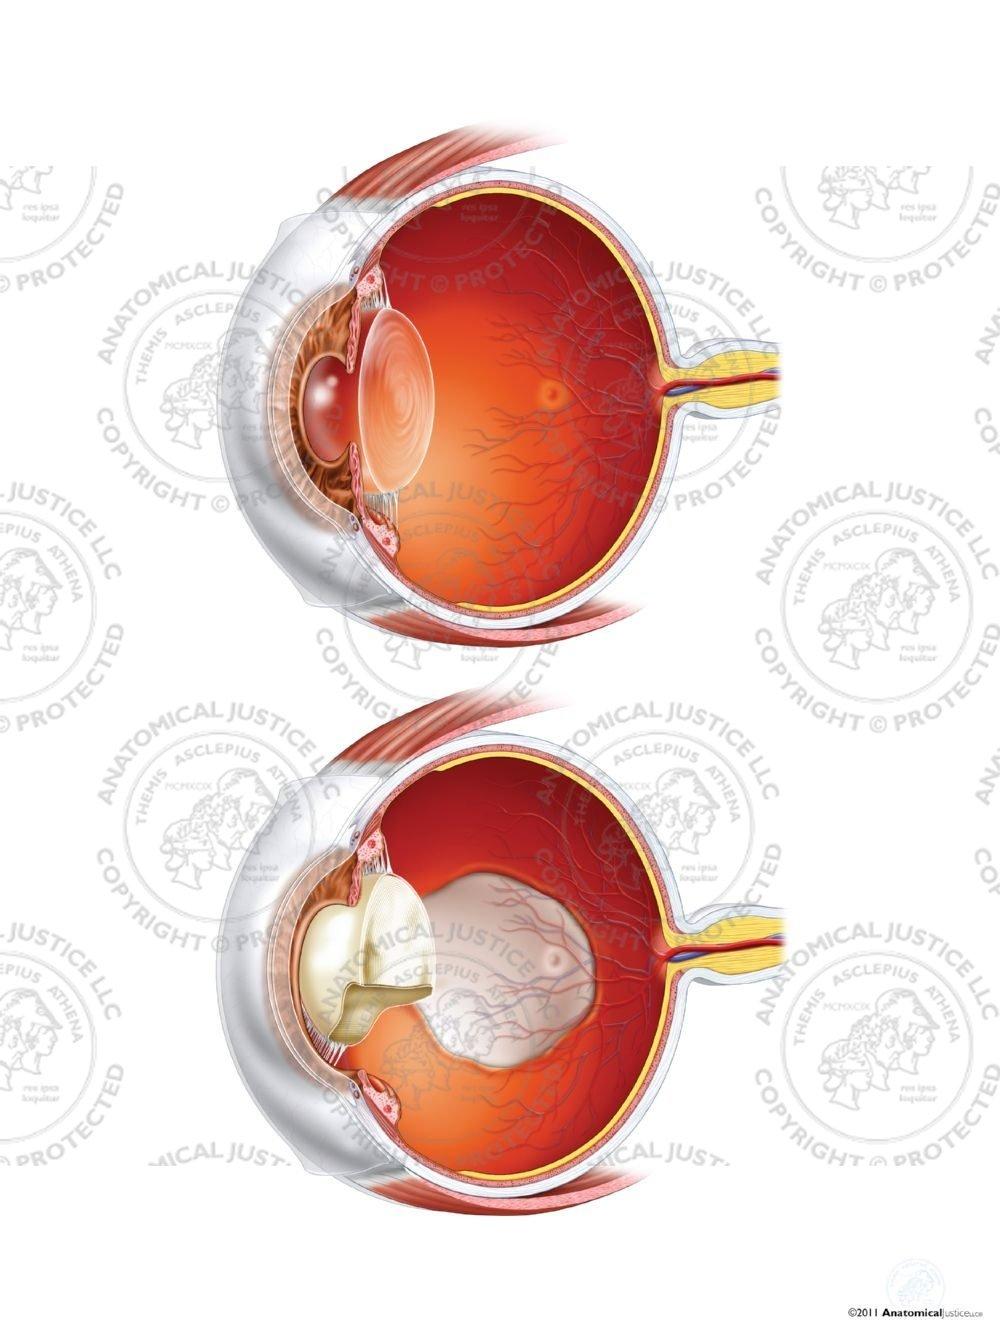 Normal Right Eye Anatomy Vs Coloboma Staphyloma And Cataract No